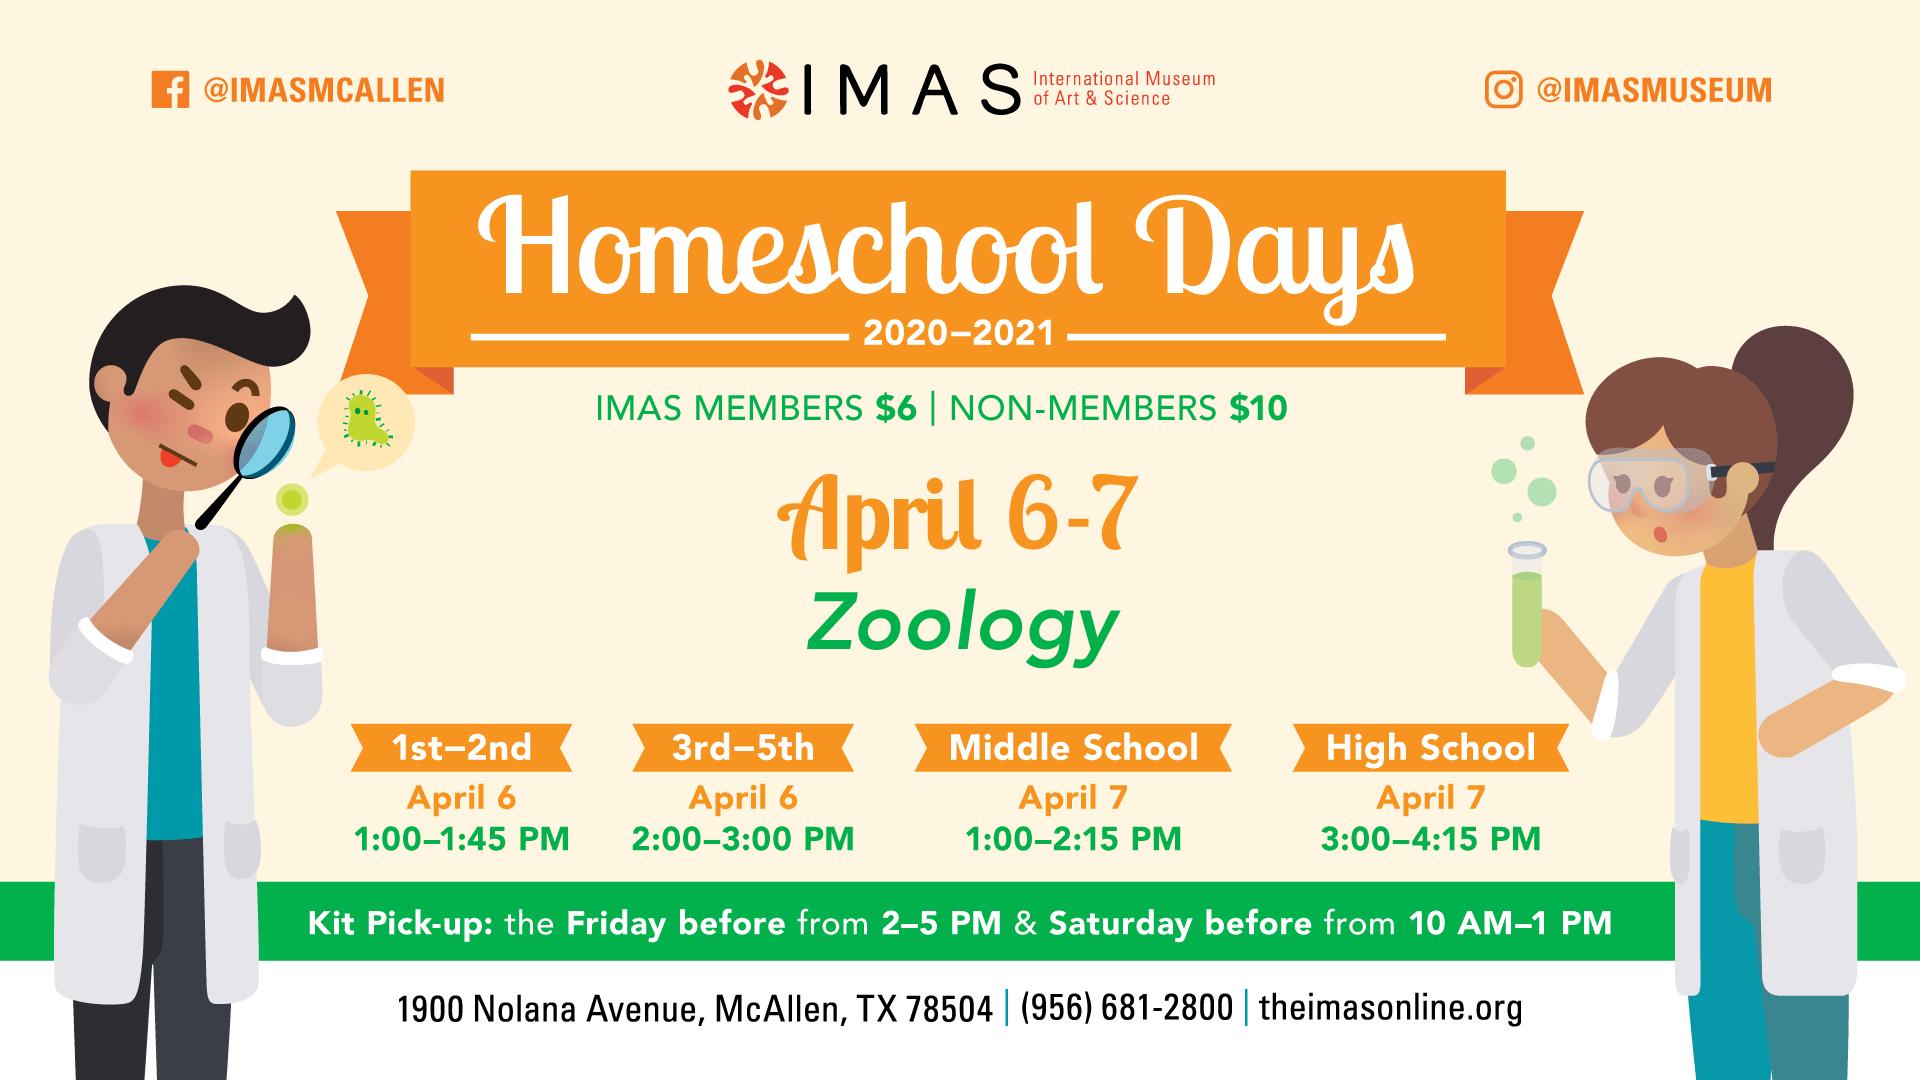 Homeschool Days at IMAS -April